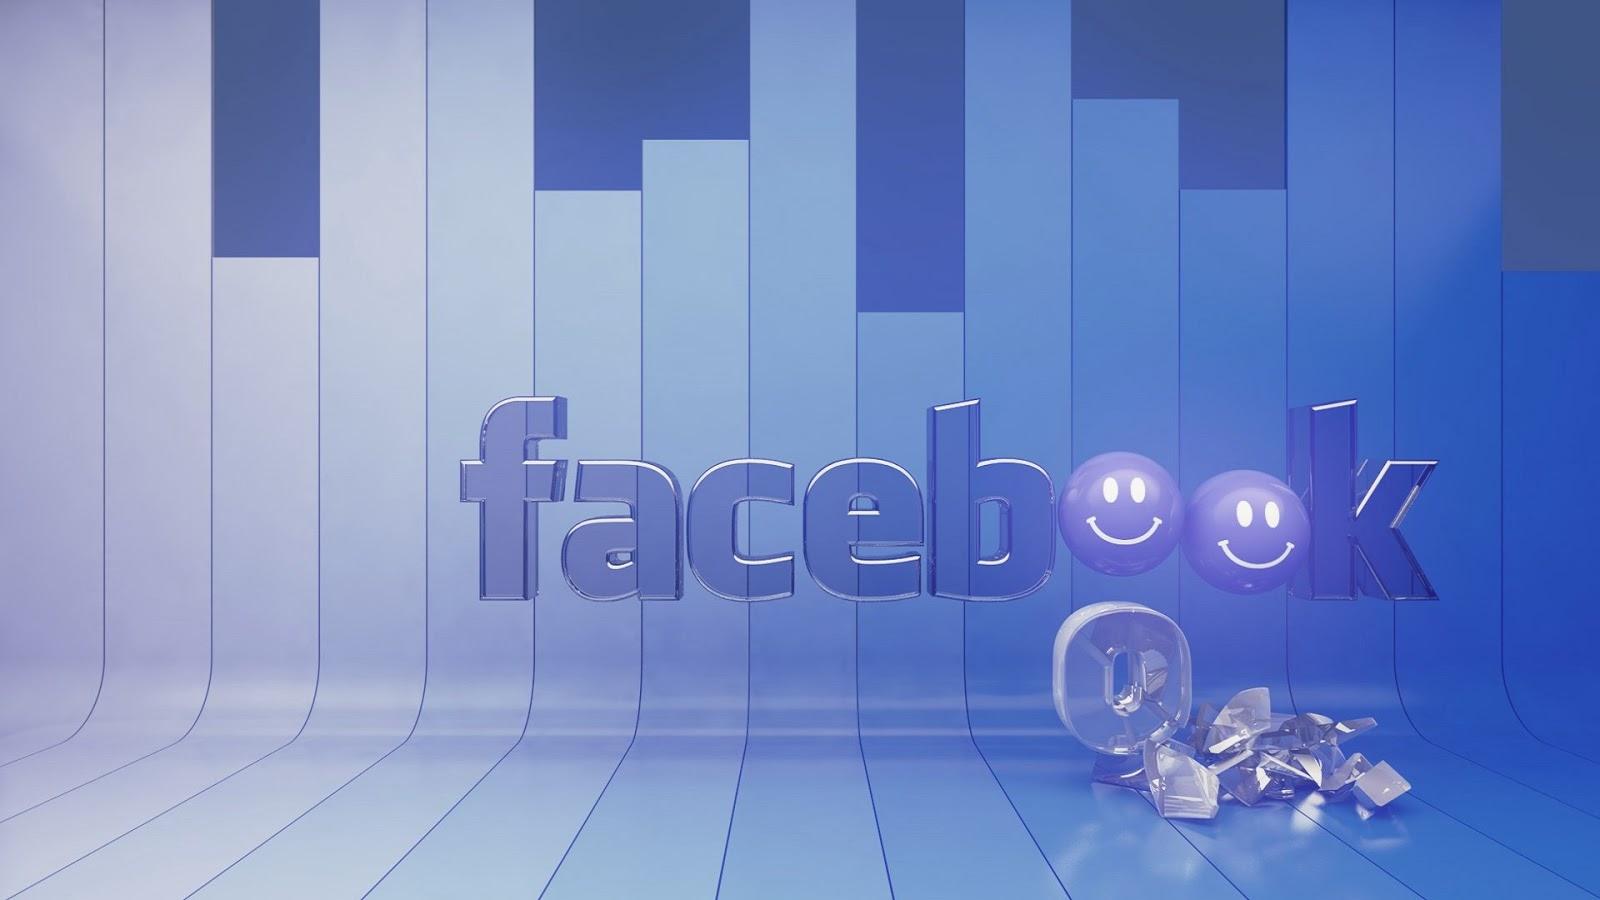 cara mengganti nama facebook menjadi